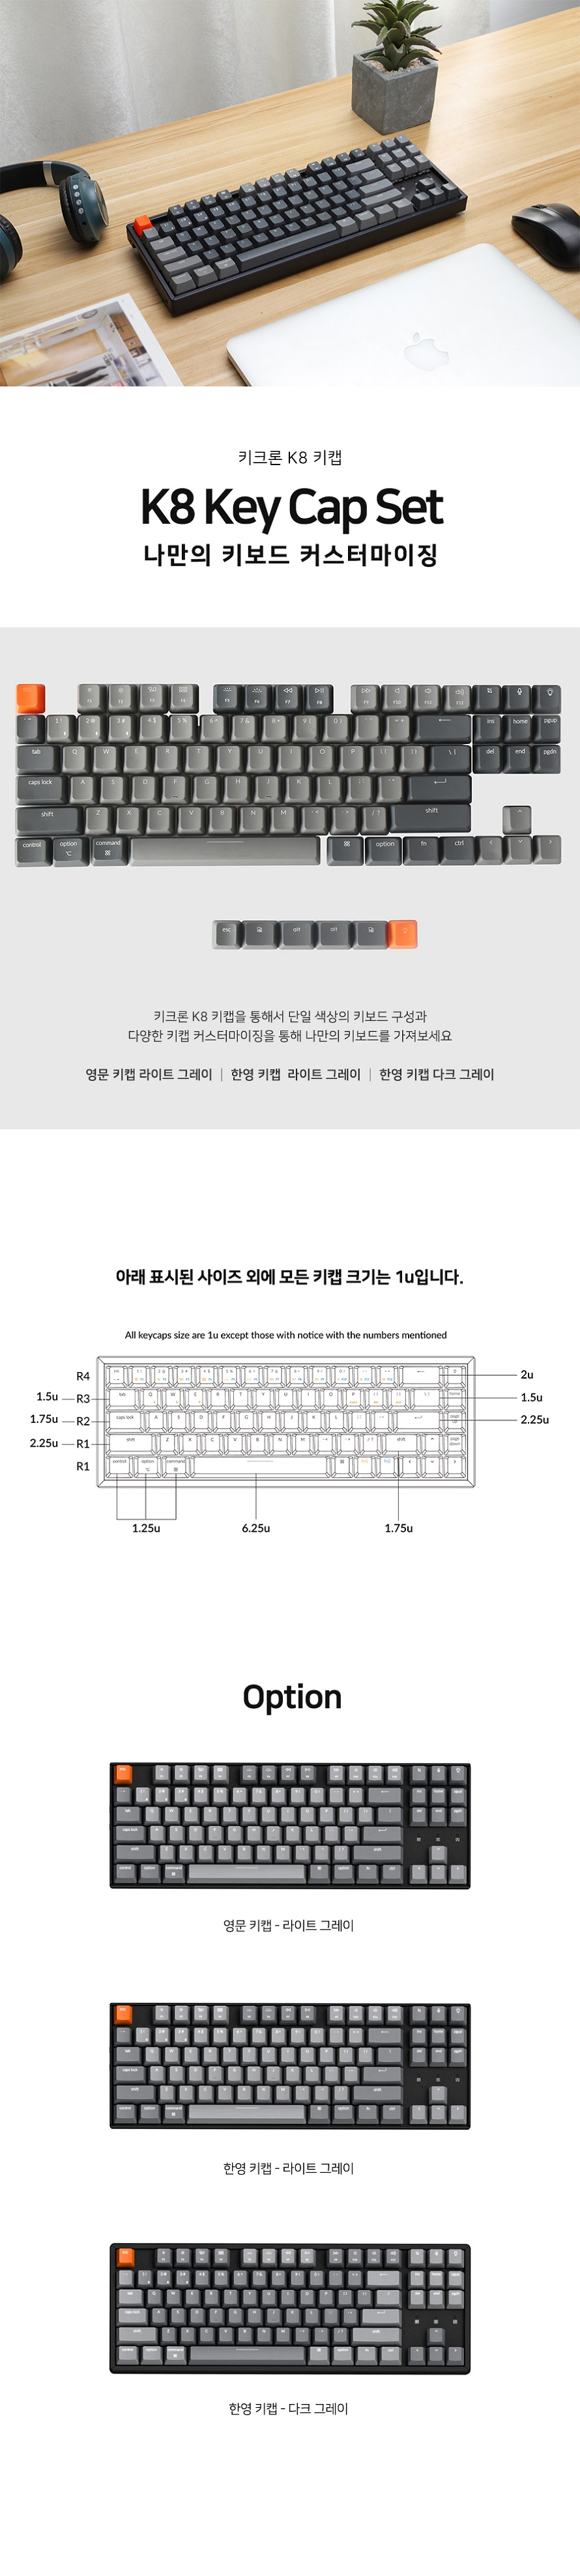 Keychron K8용 한글 키캡 (라이트 그레이)